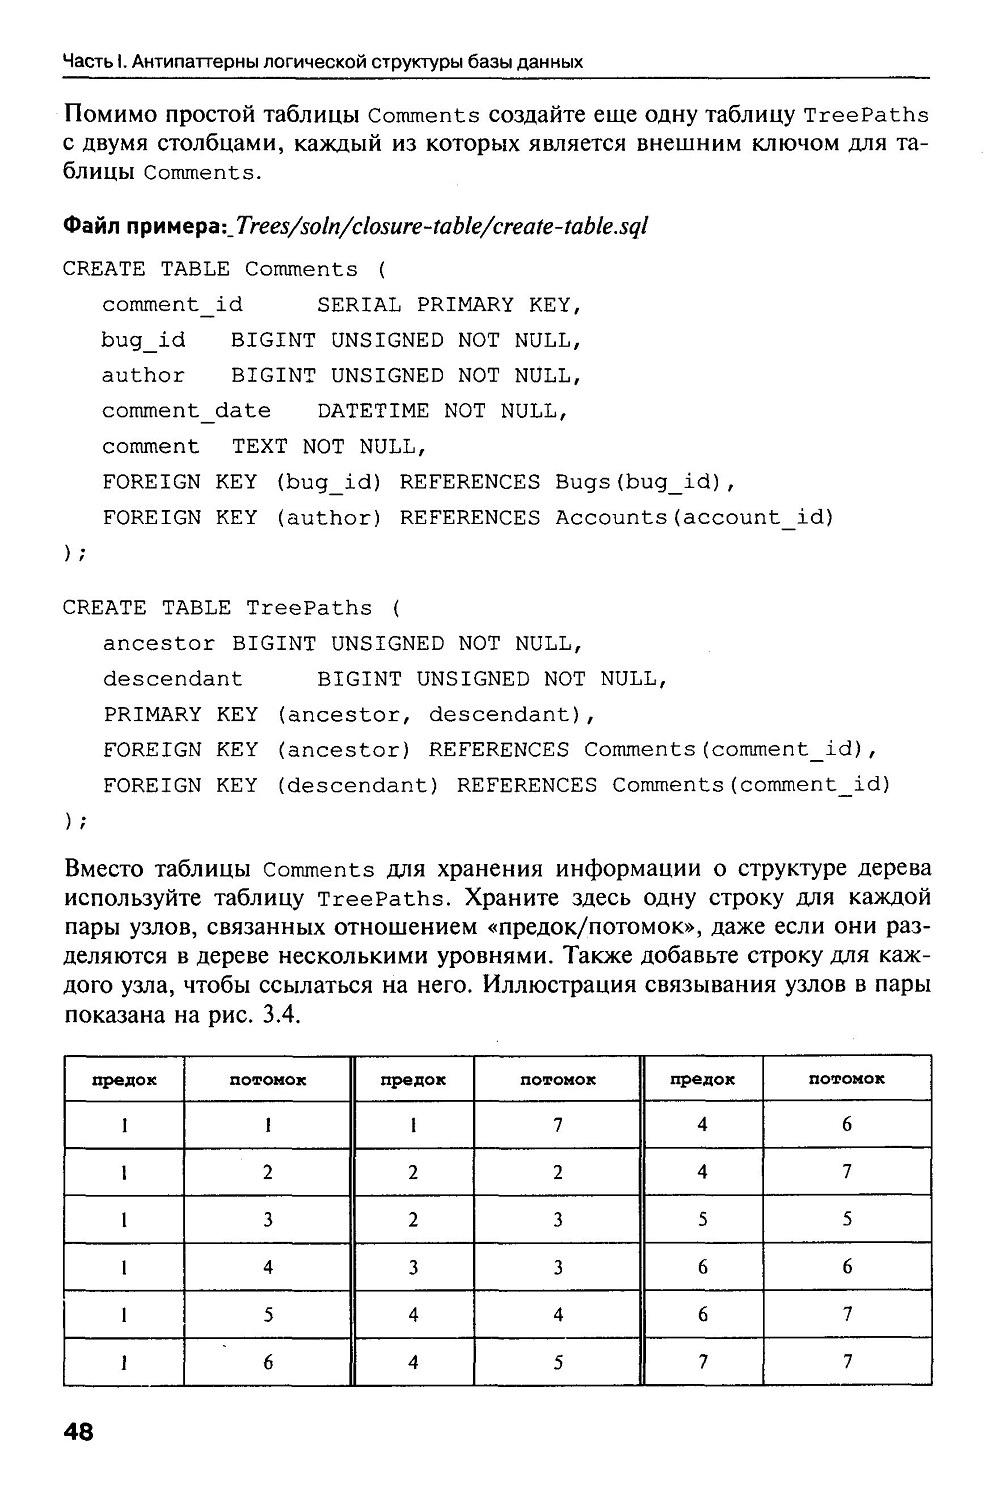 http://i6.imageban.ru/out/2014/01/20/d96b8d14d22febecf2b8dede5538cd4f.jpg